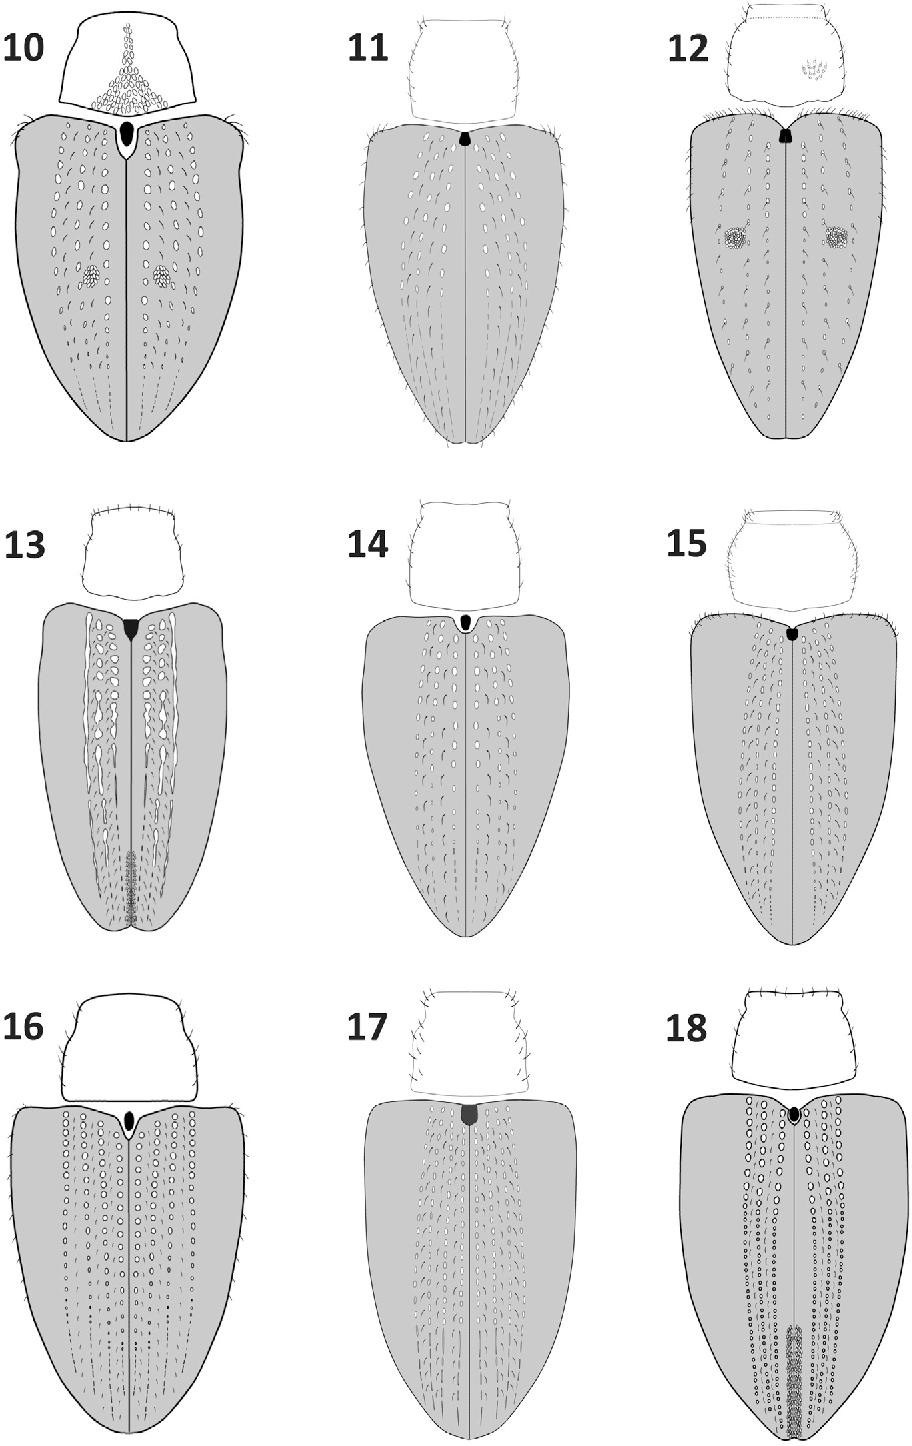 figure 10–18